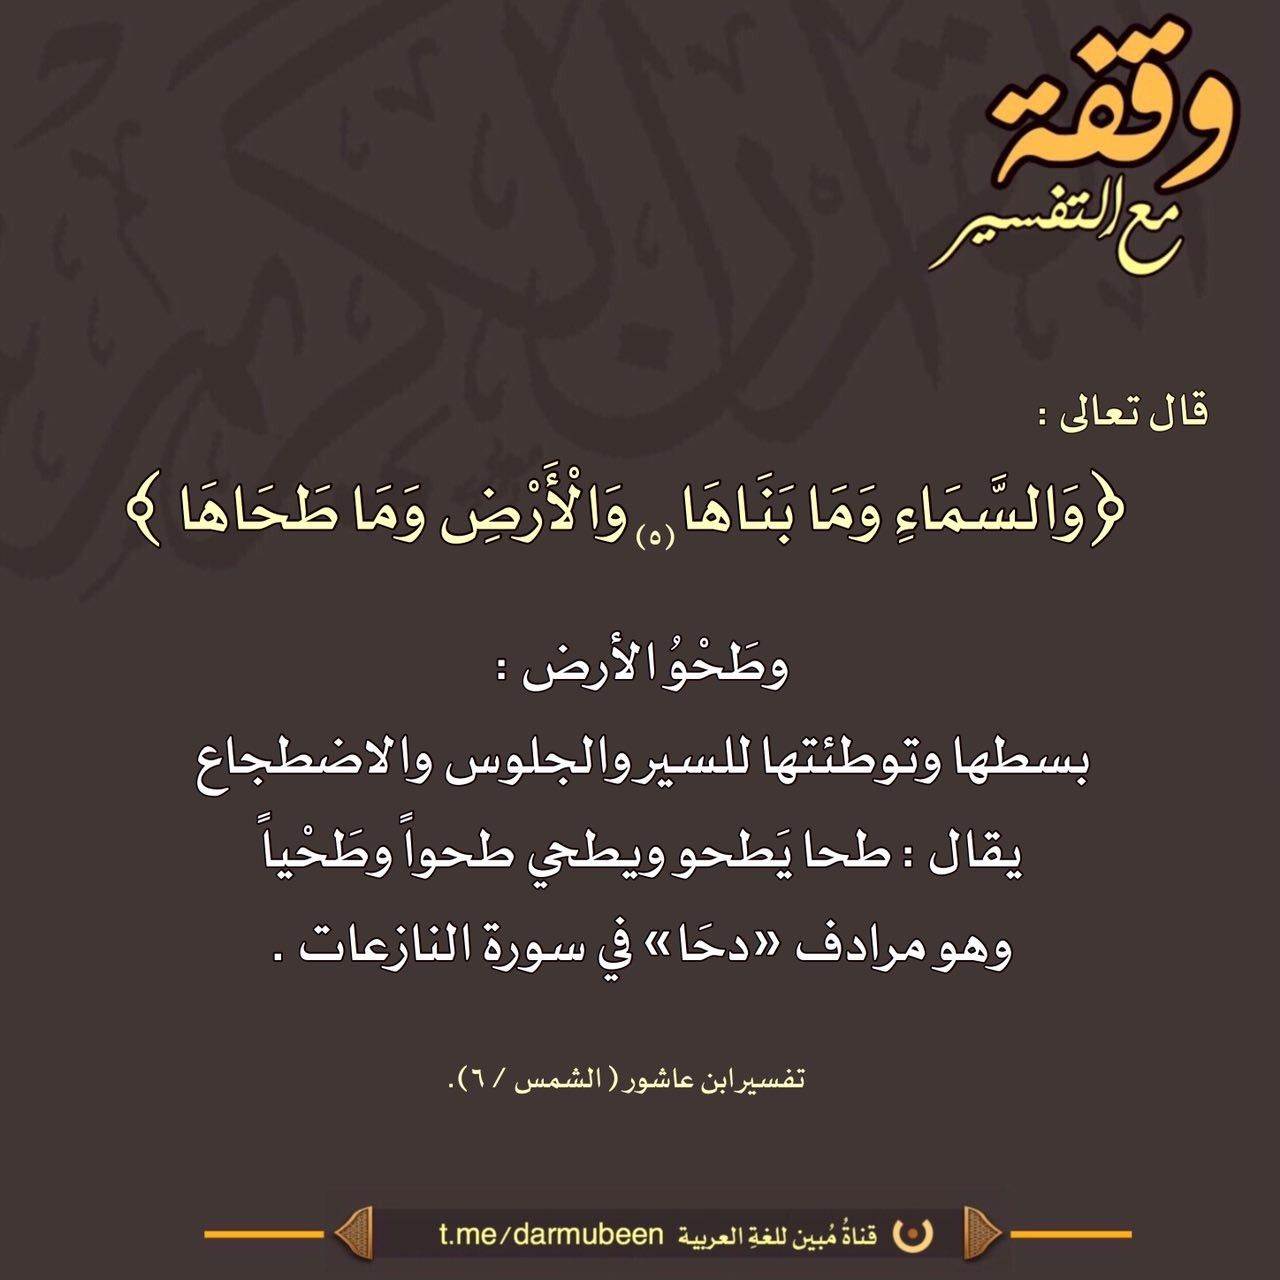 معنى قوله تعالى و ال أ ر ض و م ا ط ح اه ا Calligraphy Arabic Calligraphy